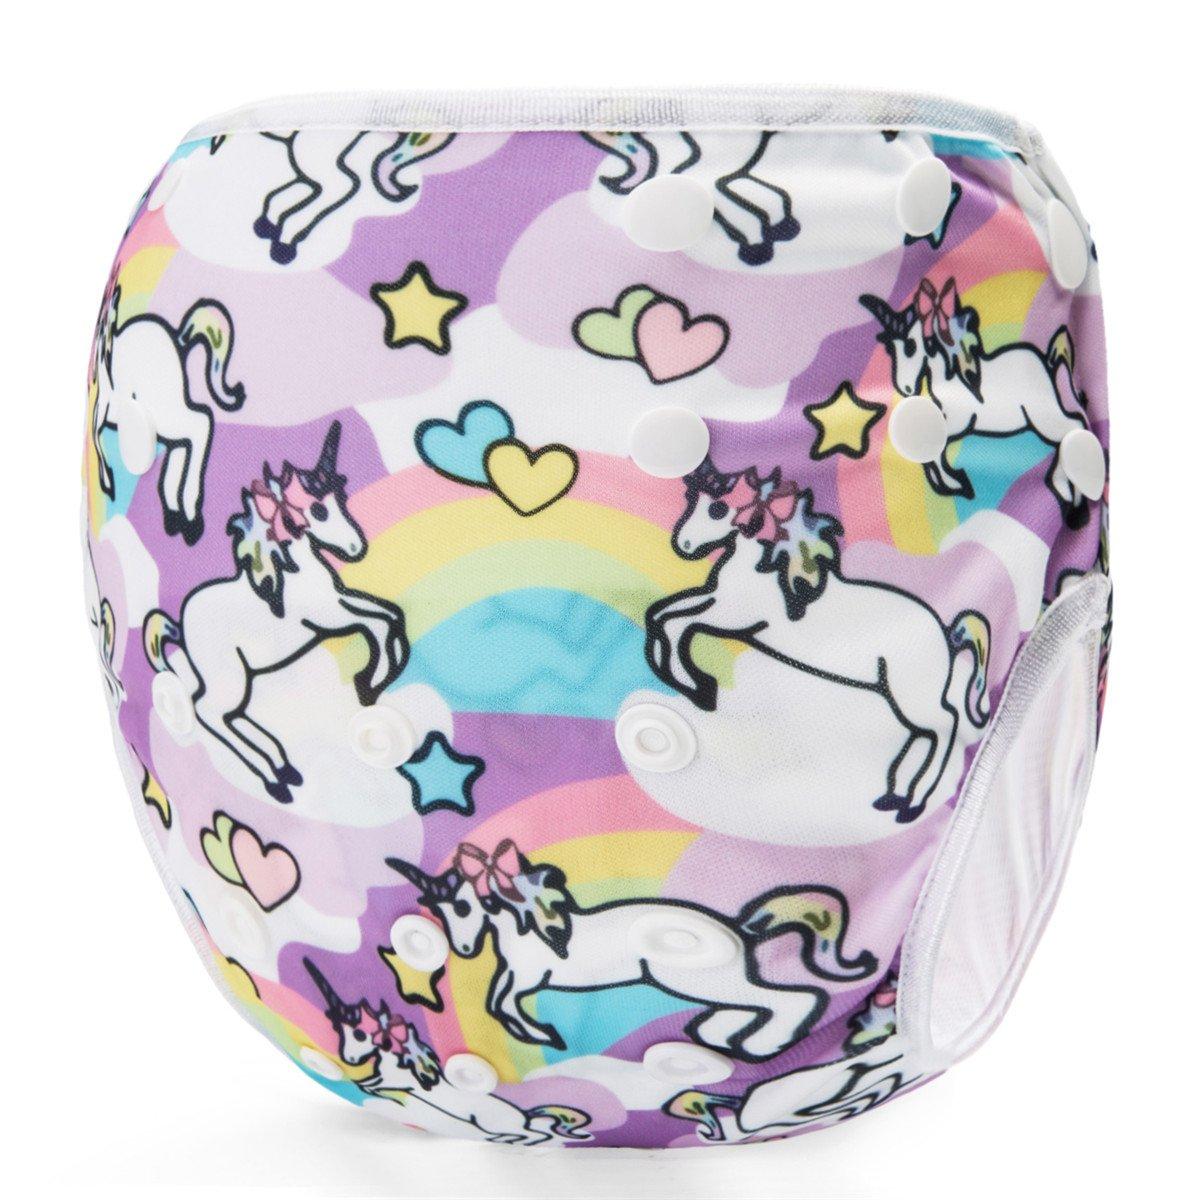 Storeofbaby Baby Reusable Swim Diaper Adjustable Washable Infant Swimwear